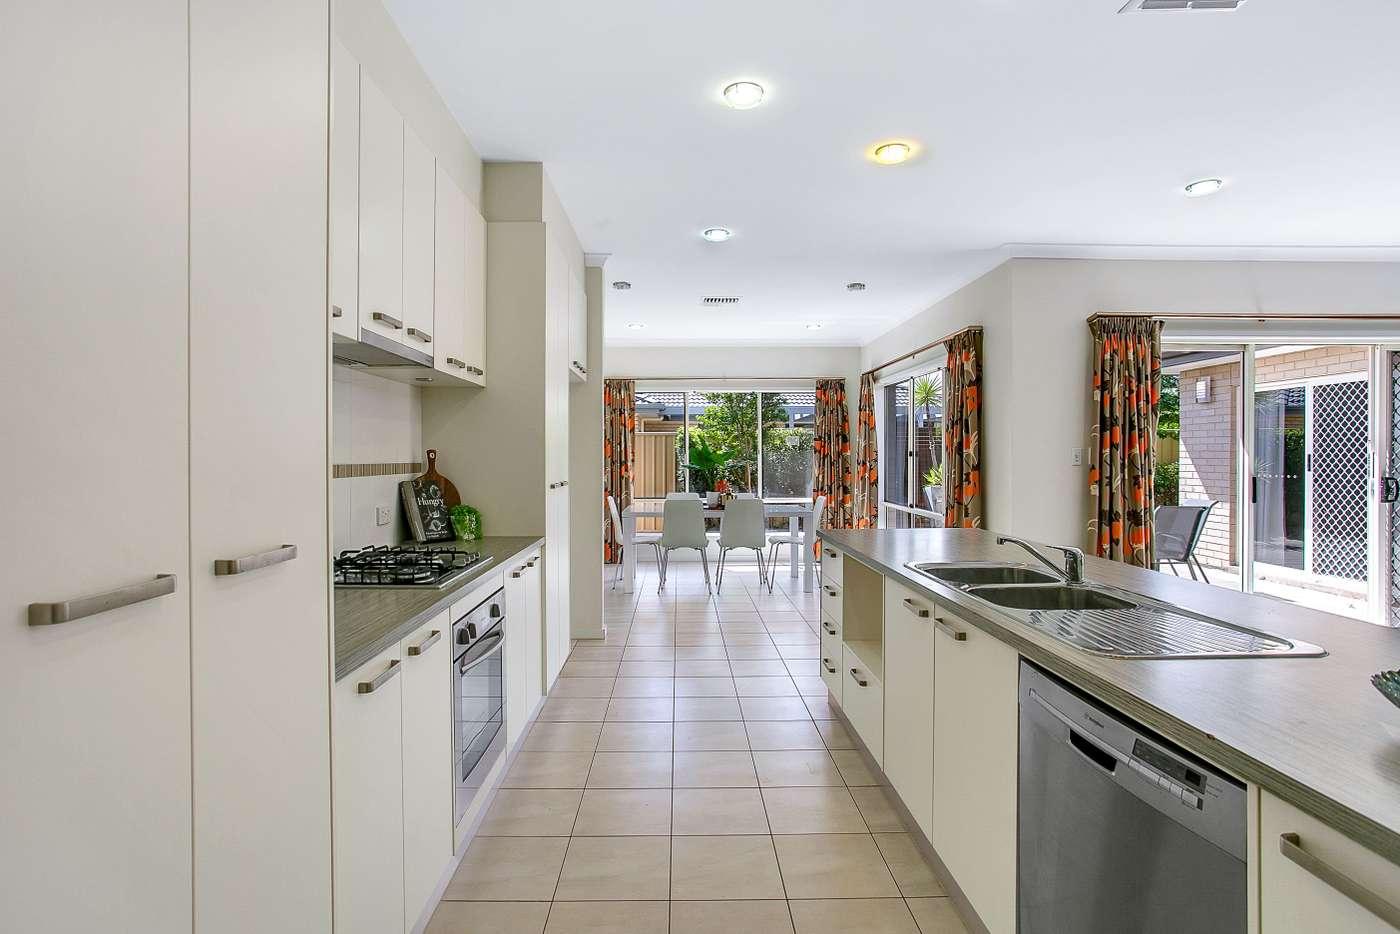 Sixth view of Homely house listing, 94 Aldinga Beach Road, Aldinga Beach SA 5173